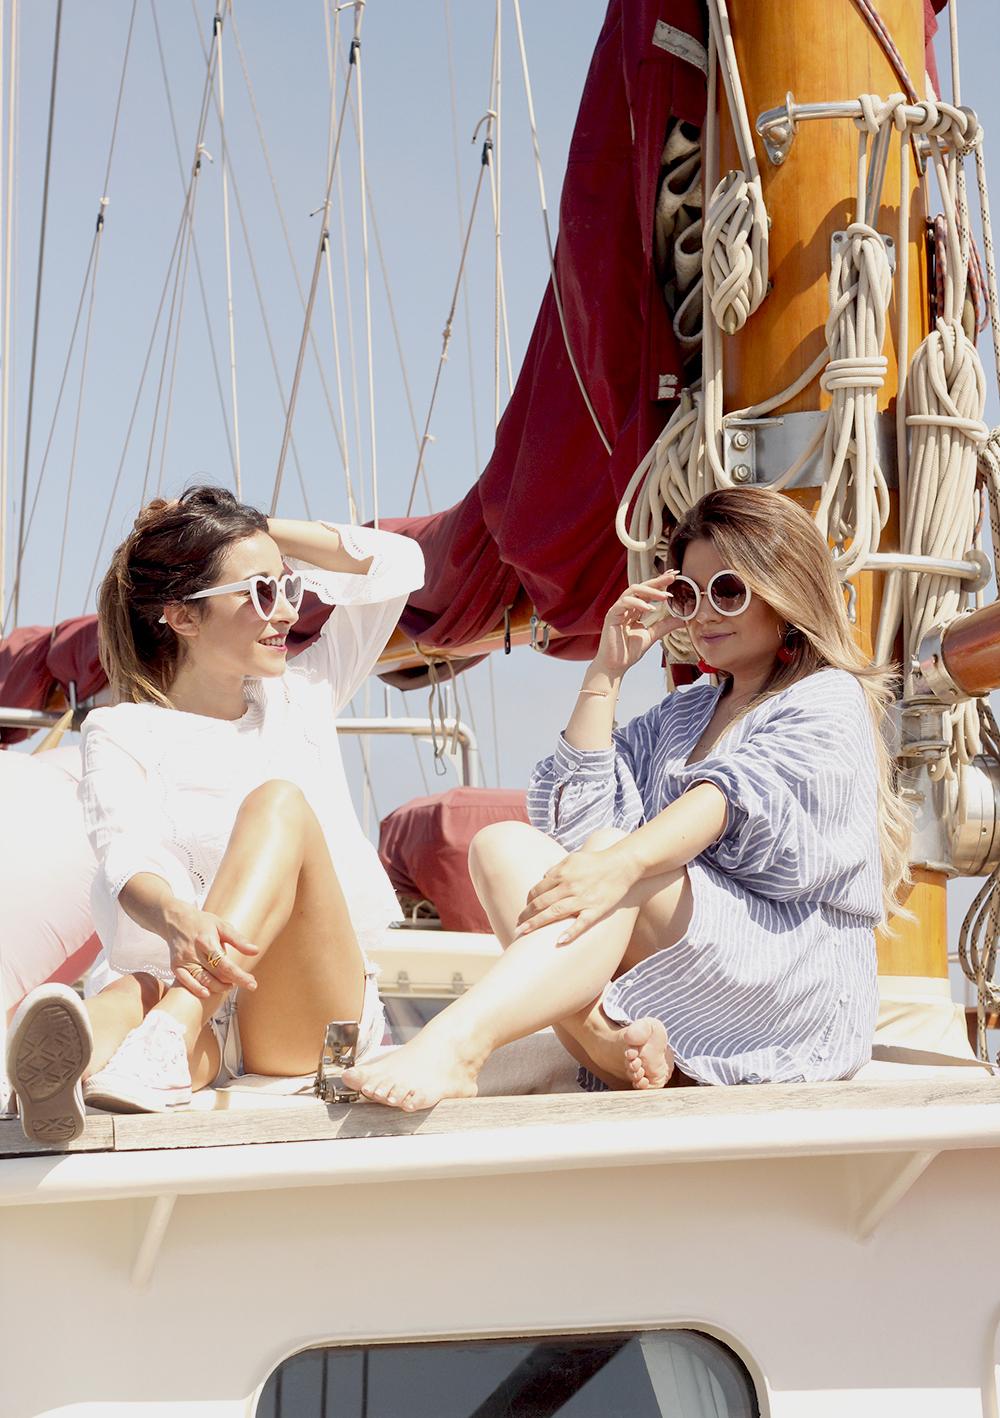 boat ride in Barcelona lottie london make up summer street style outfit 201809